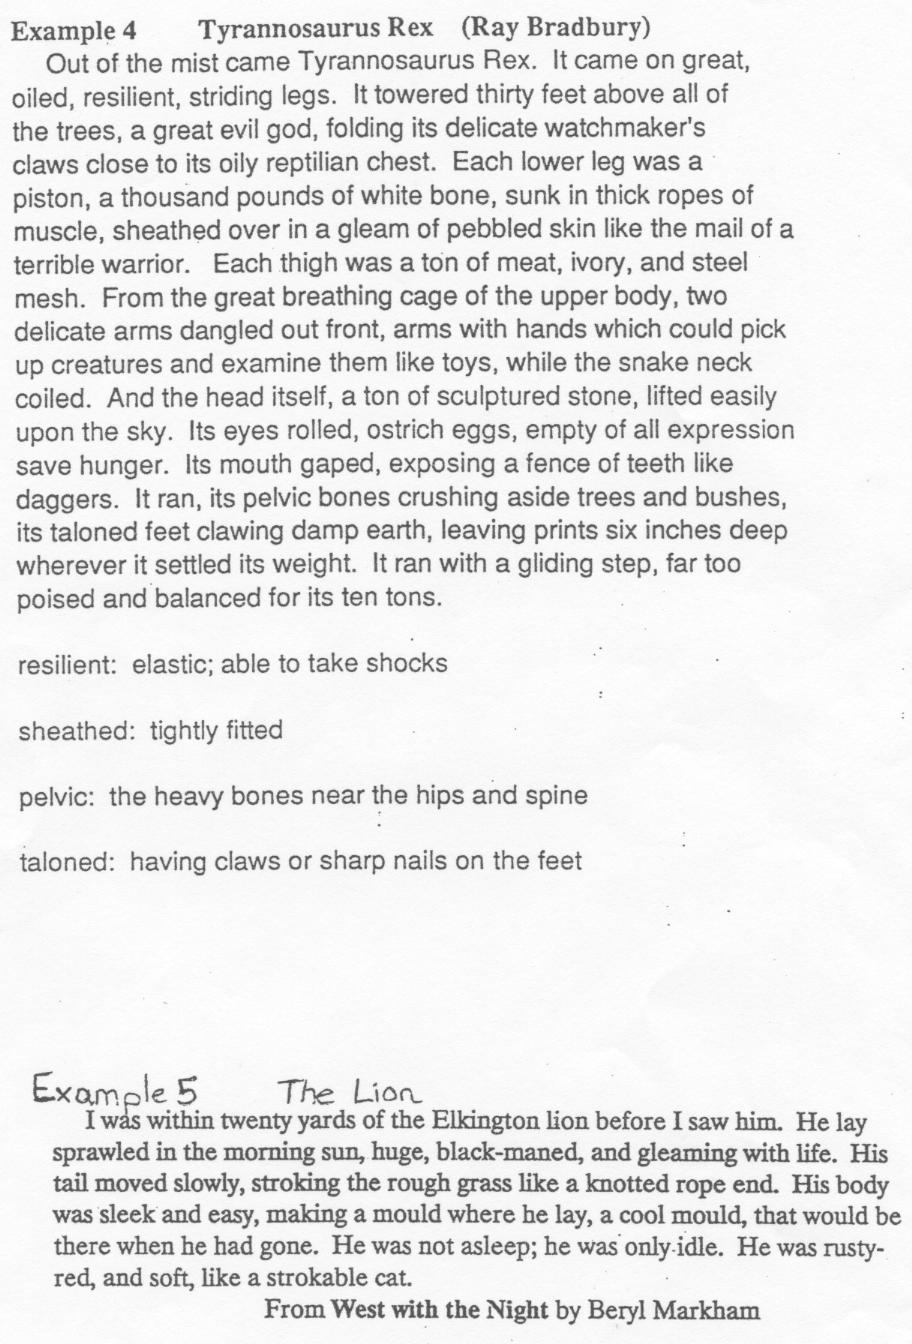 013 Descriptive Narrative Essayss Of Paragraphs And Chart 001 Remarkable Essay Examples Topics Good Full